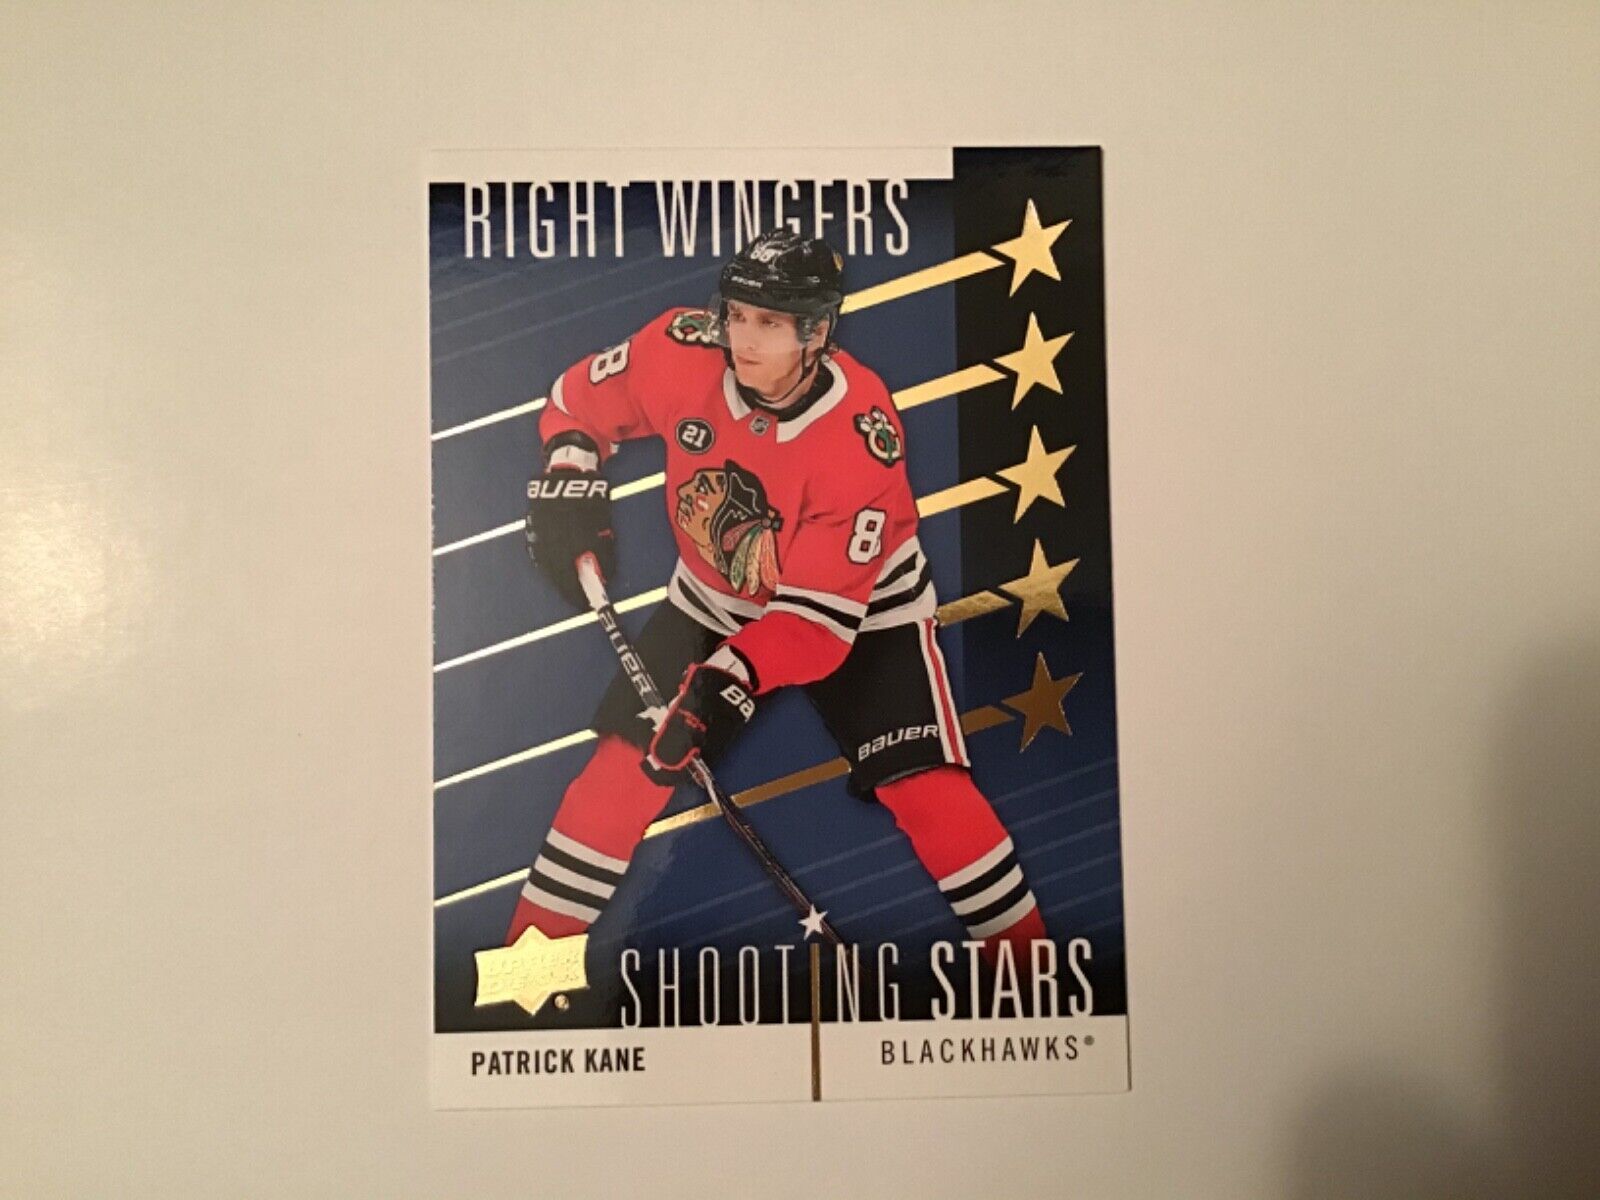 2019-20 Upper Deck Shooting Stars Right Wingers Patrick Kane SSR-1 Blackhawks - $2.95